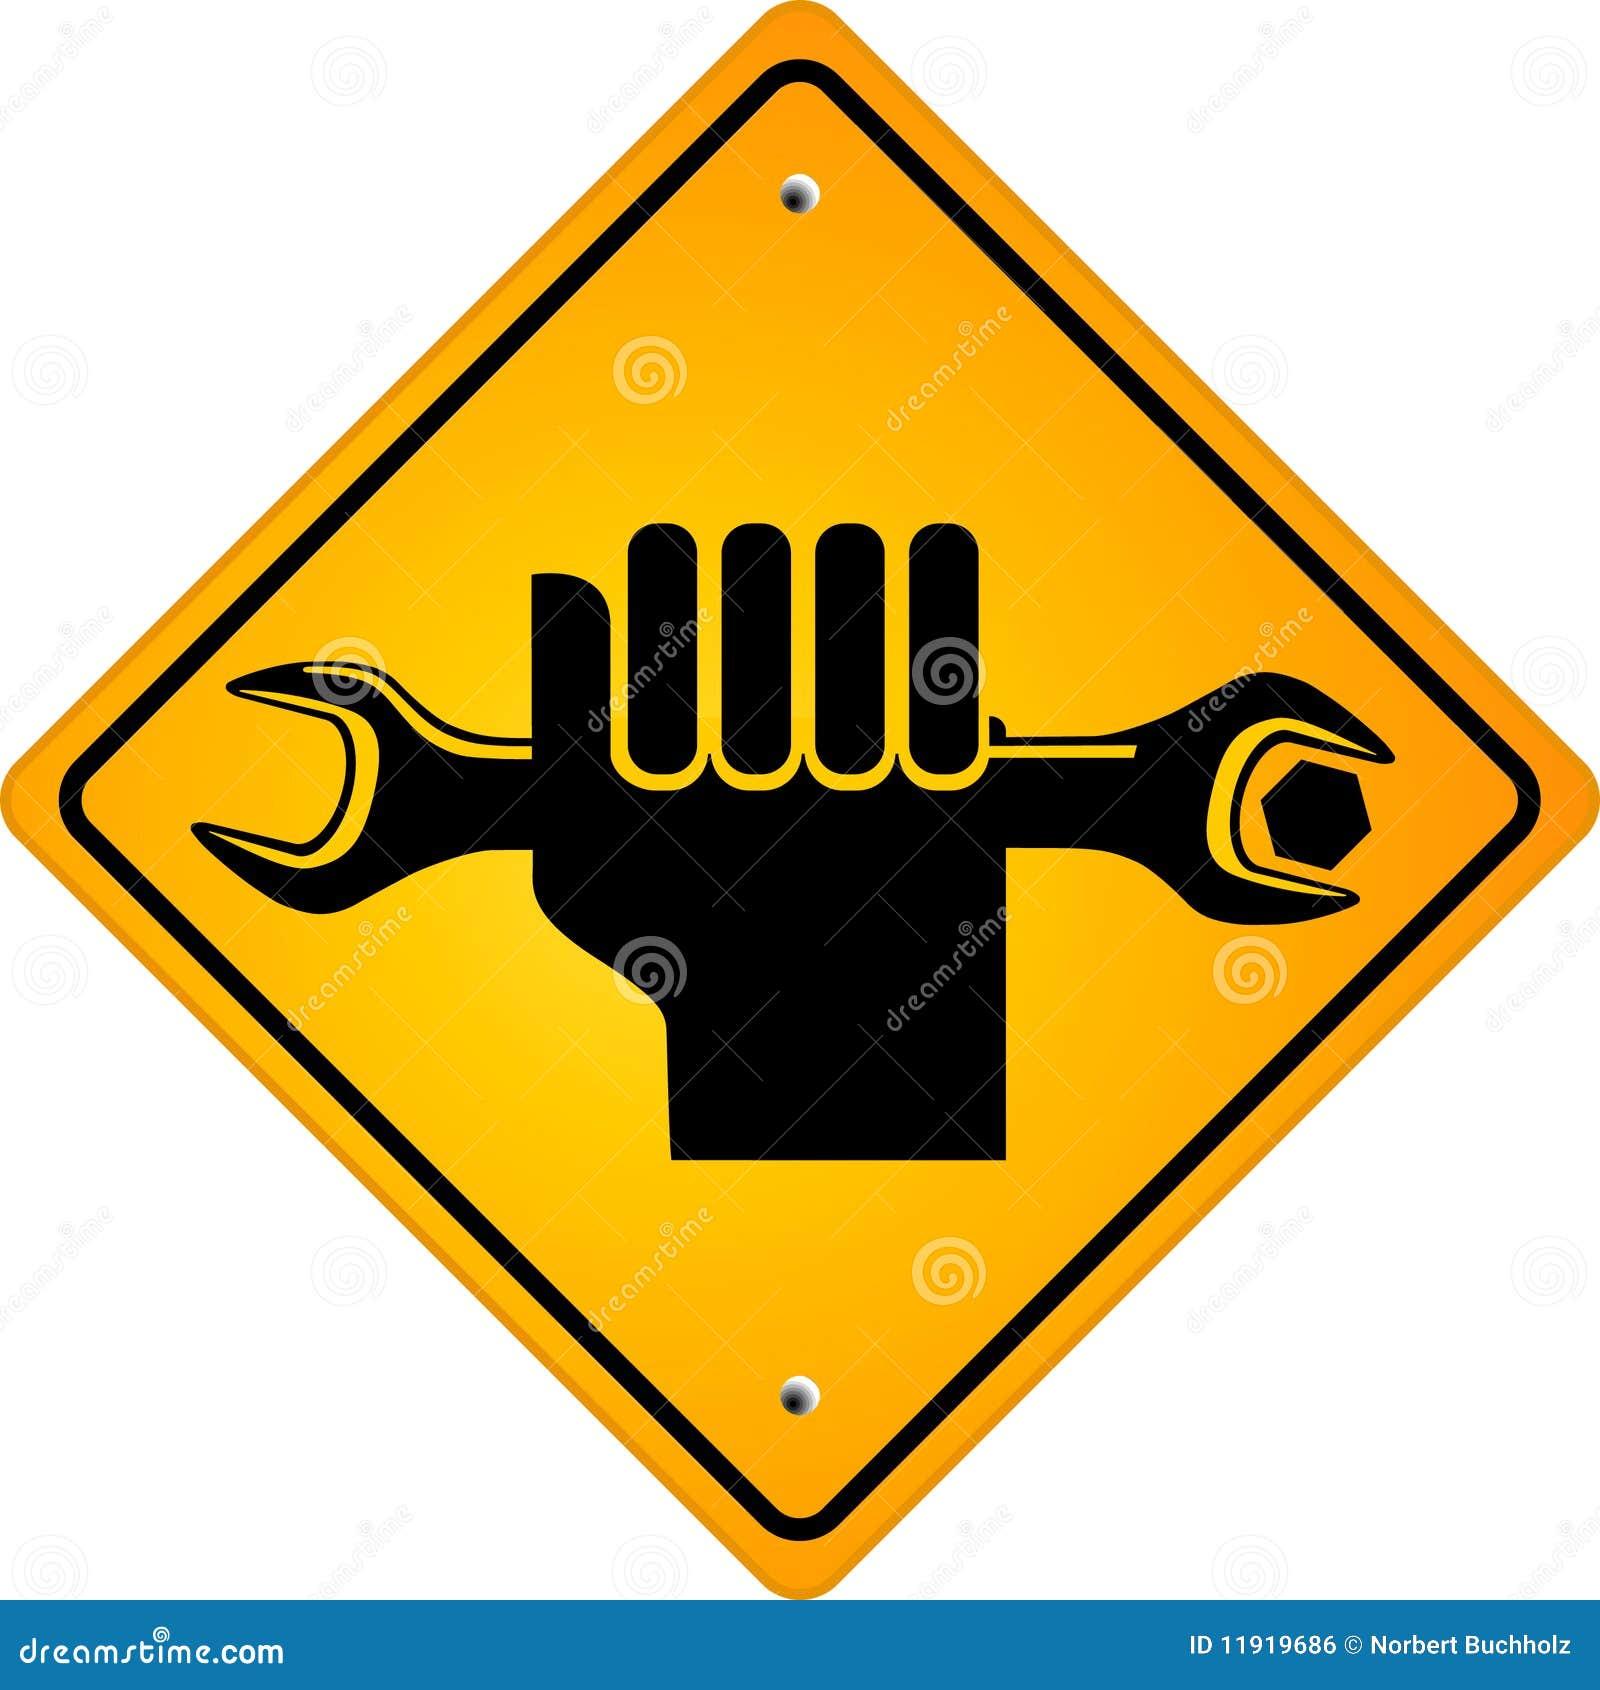 Maintenance And Repair Royalty Free Stock Image - Image ...